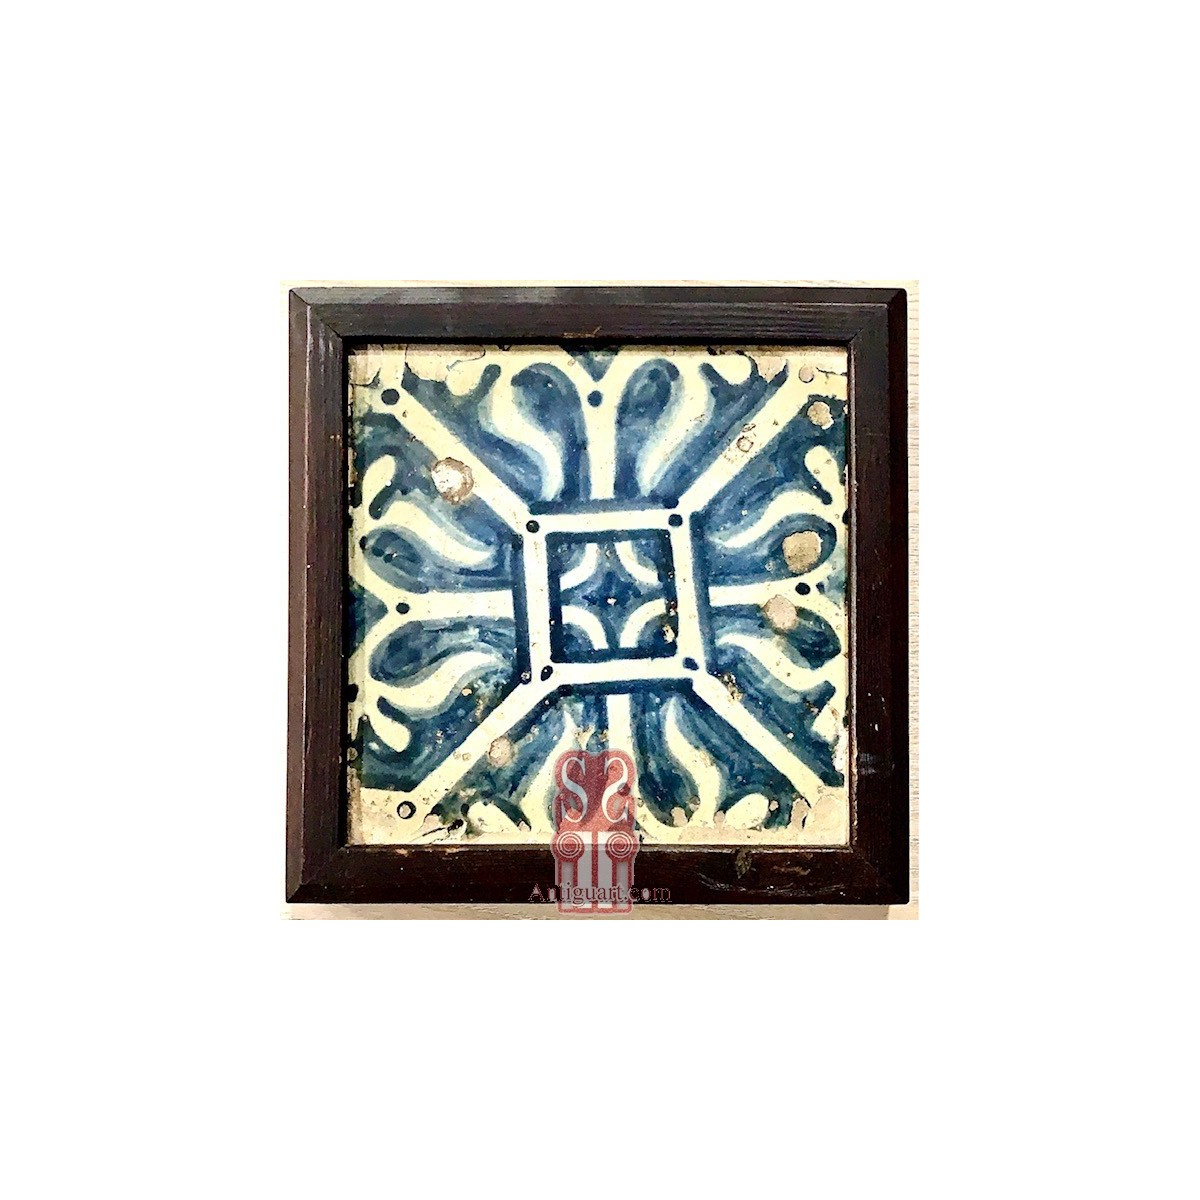 15th century tile